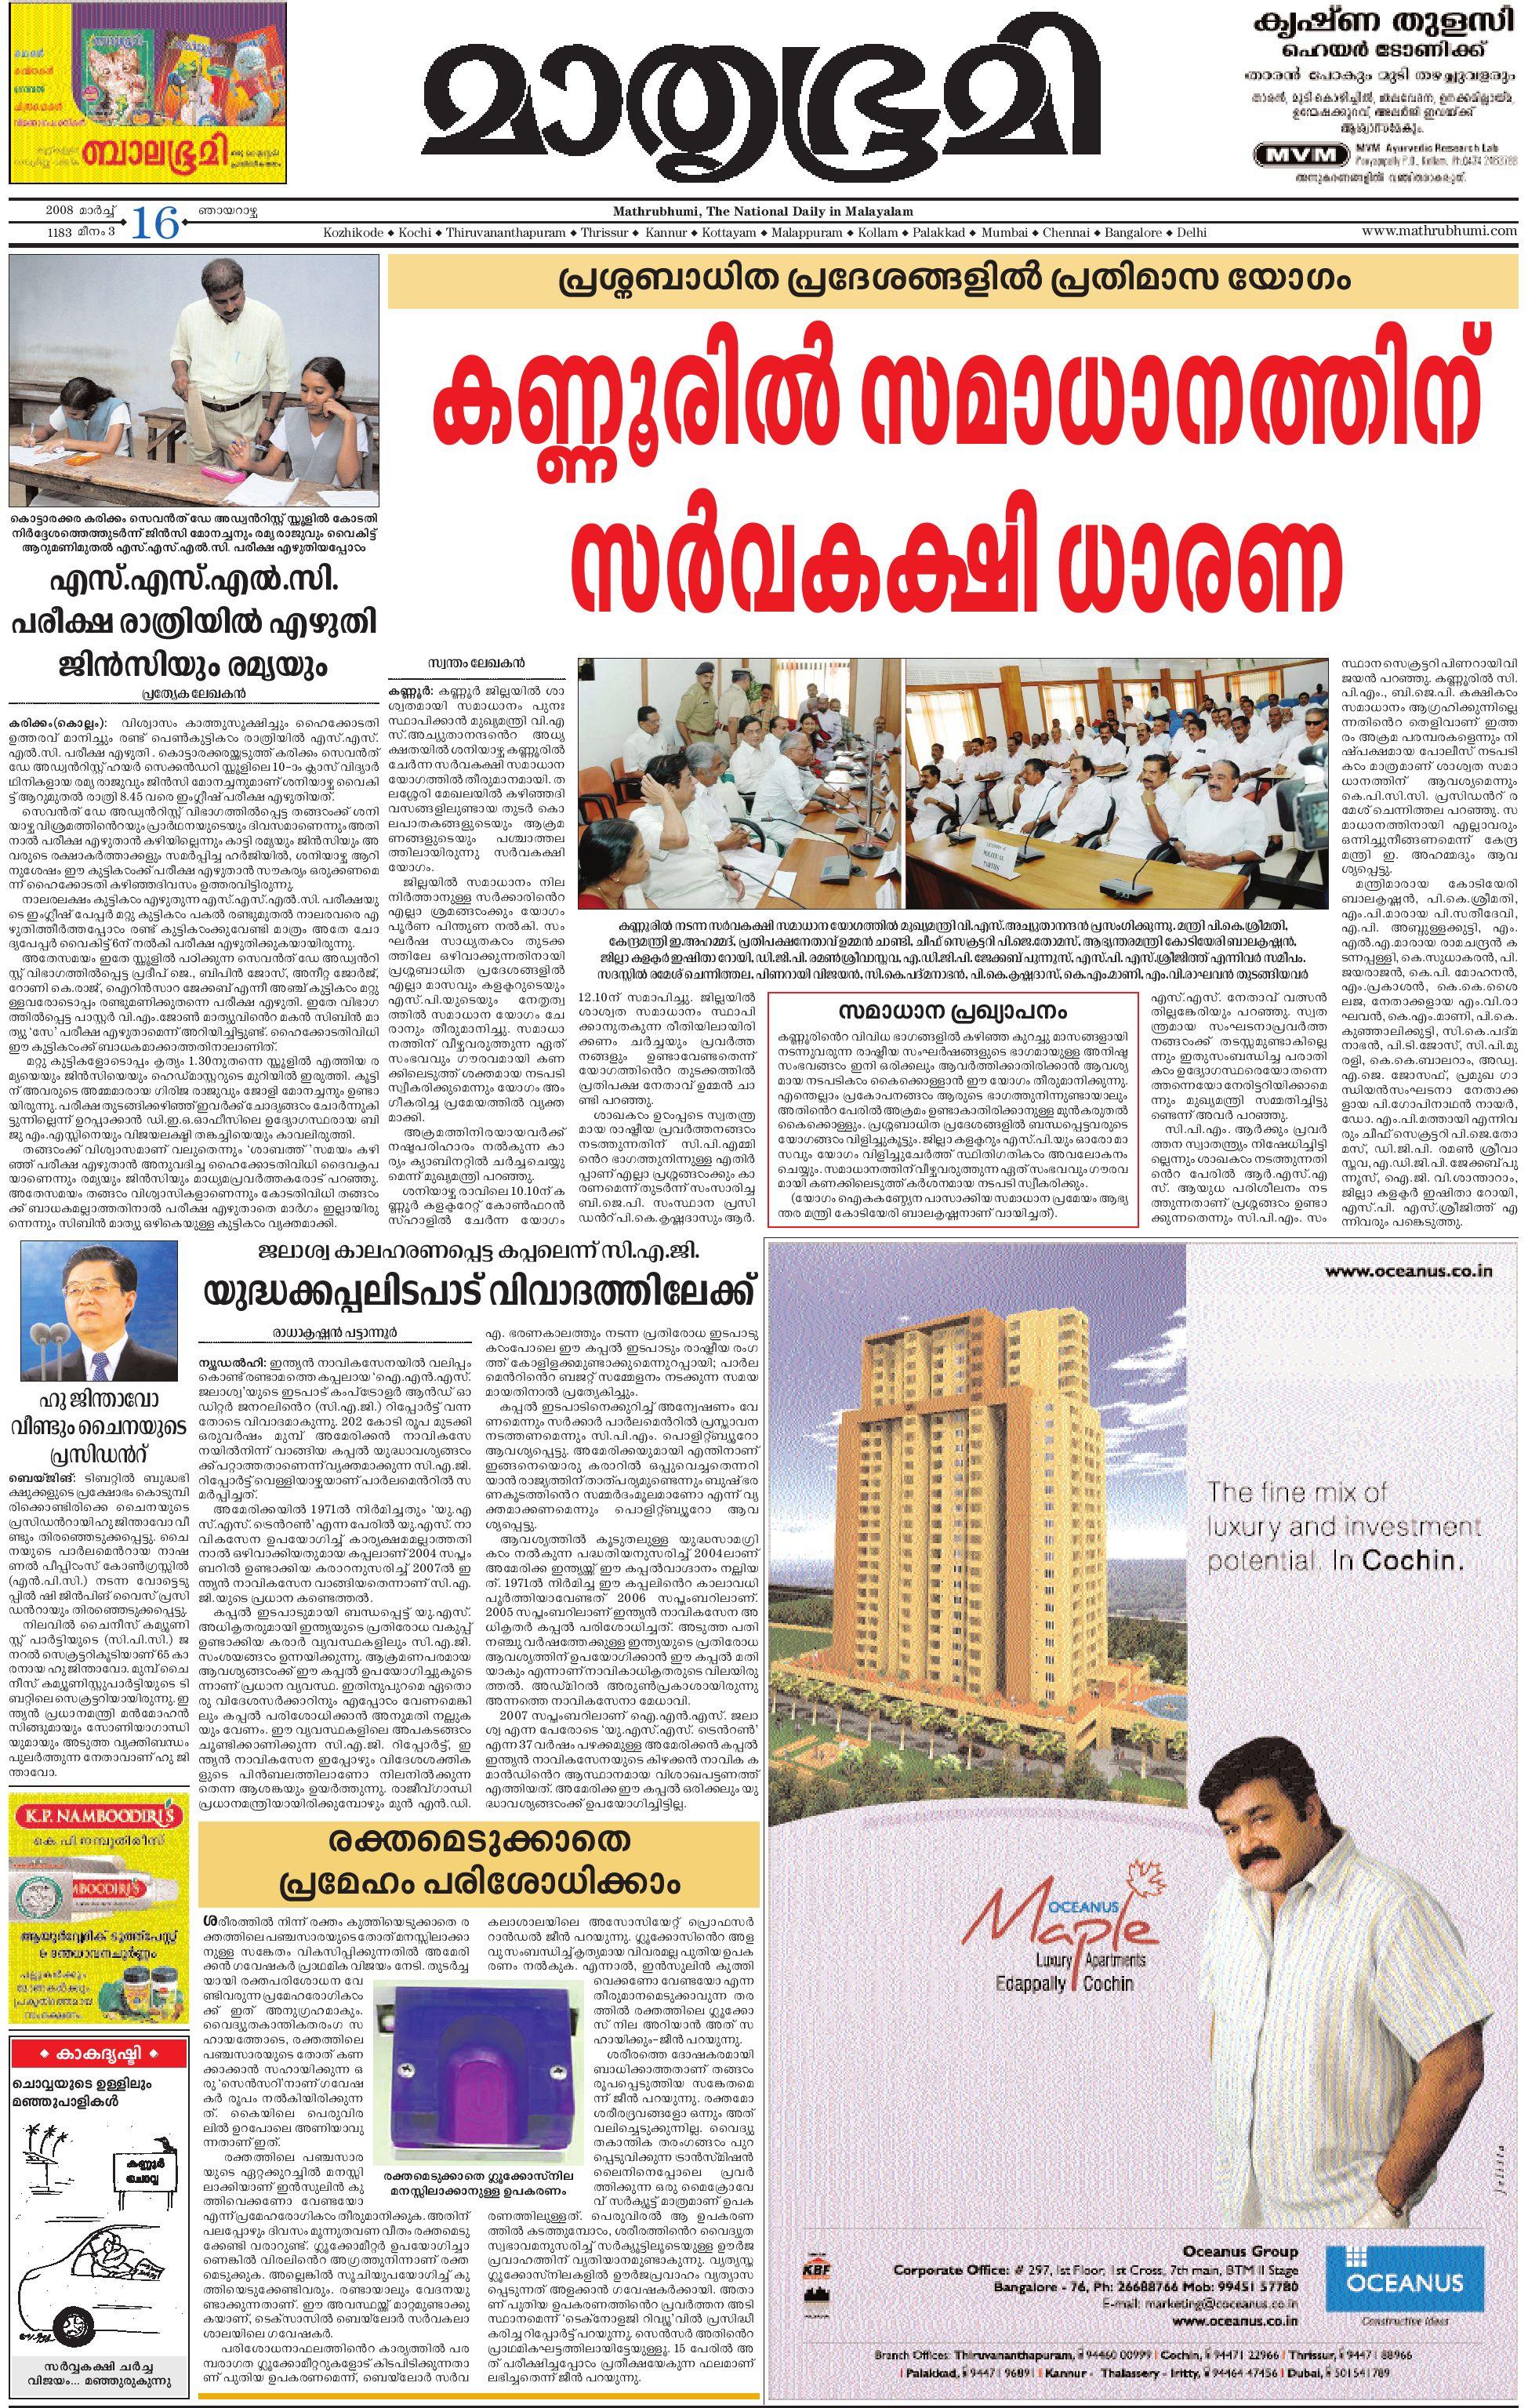 Mathrubhumi Daily by mbiclt - issuu